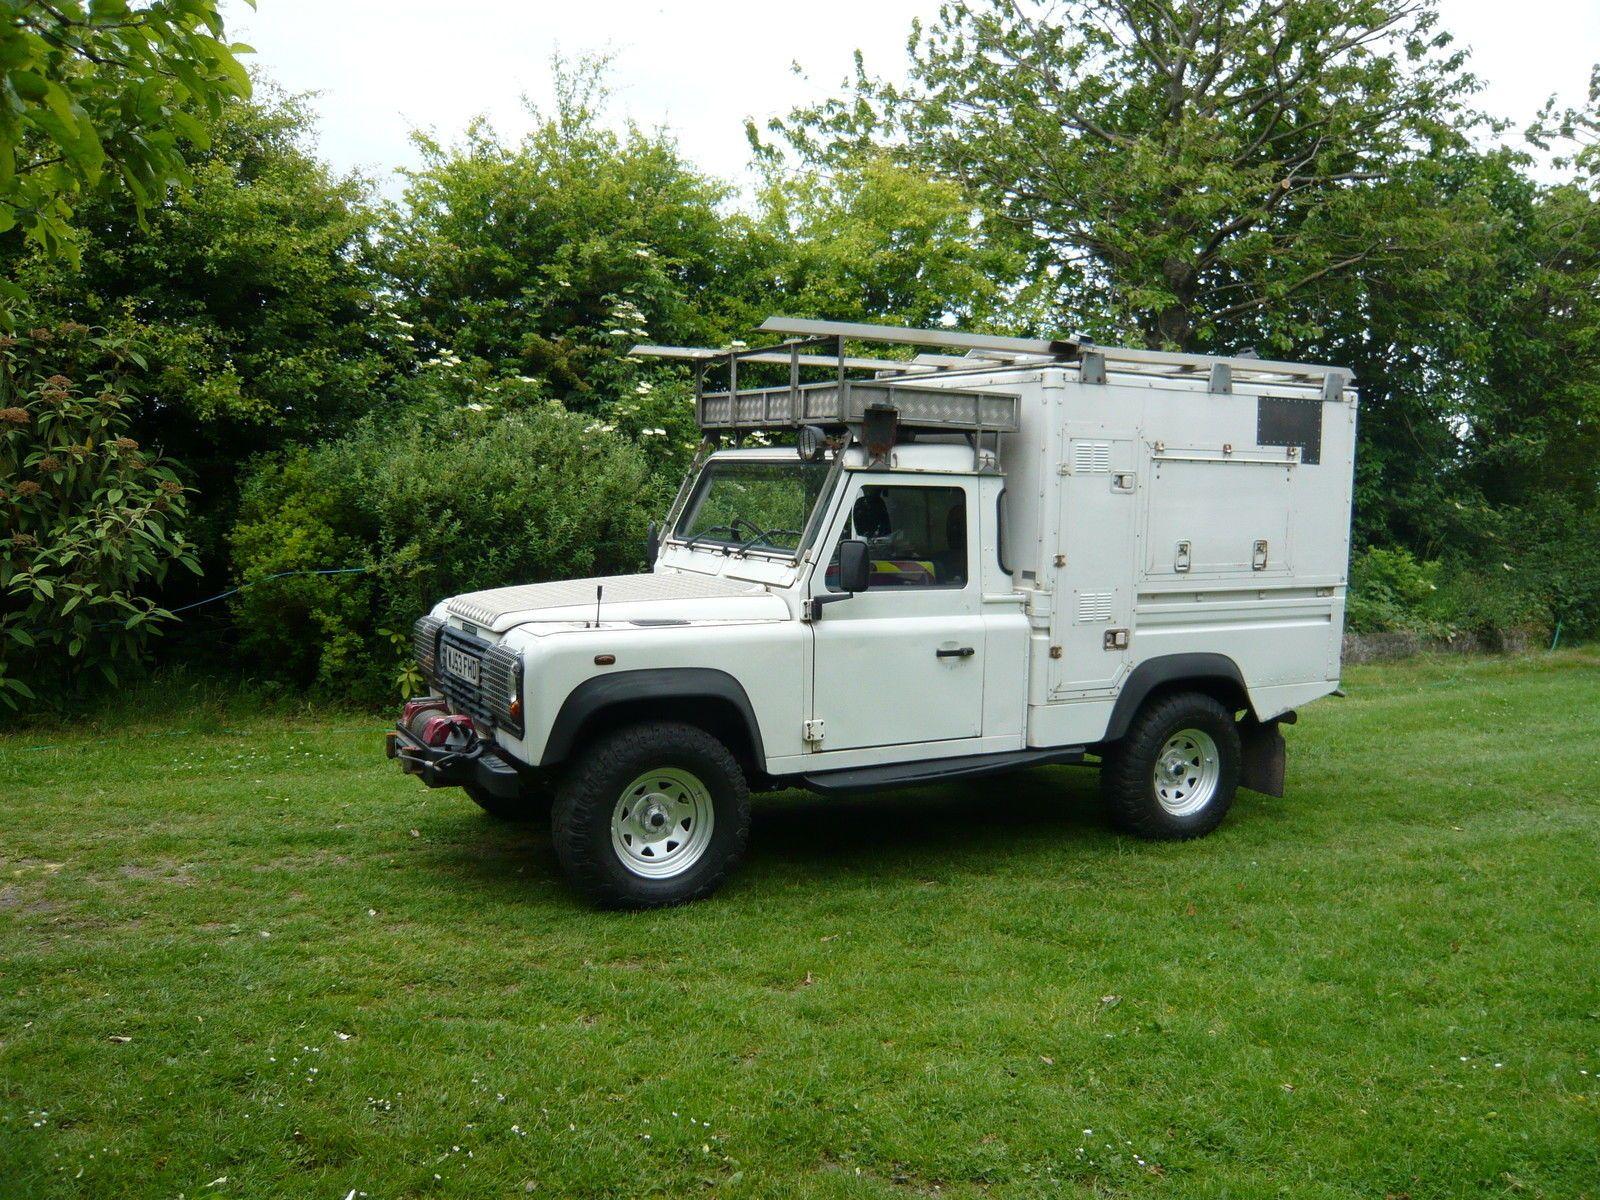 Land Rover Defender 110 TD5 Hi Cap Box | eBay | Land Rovers... then